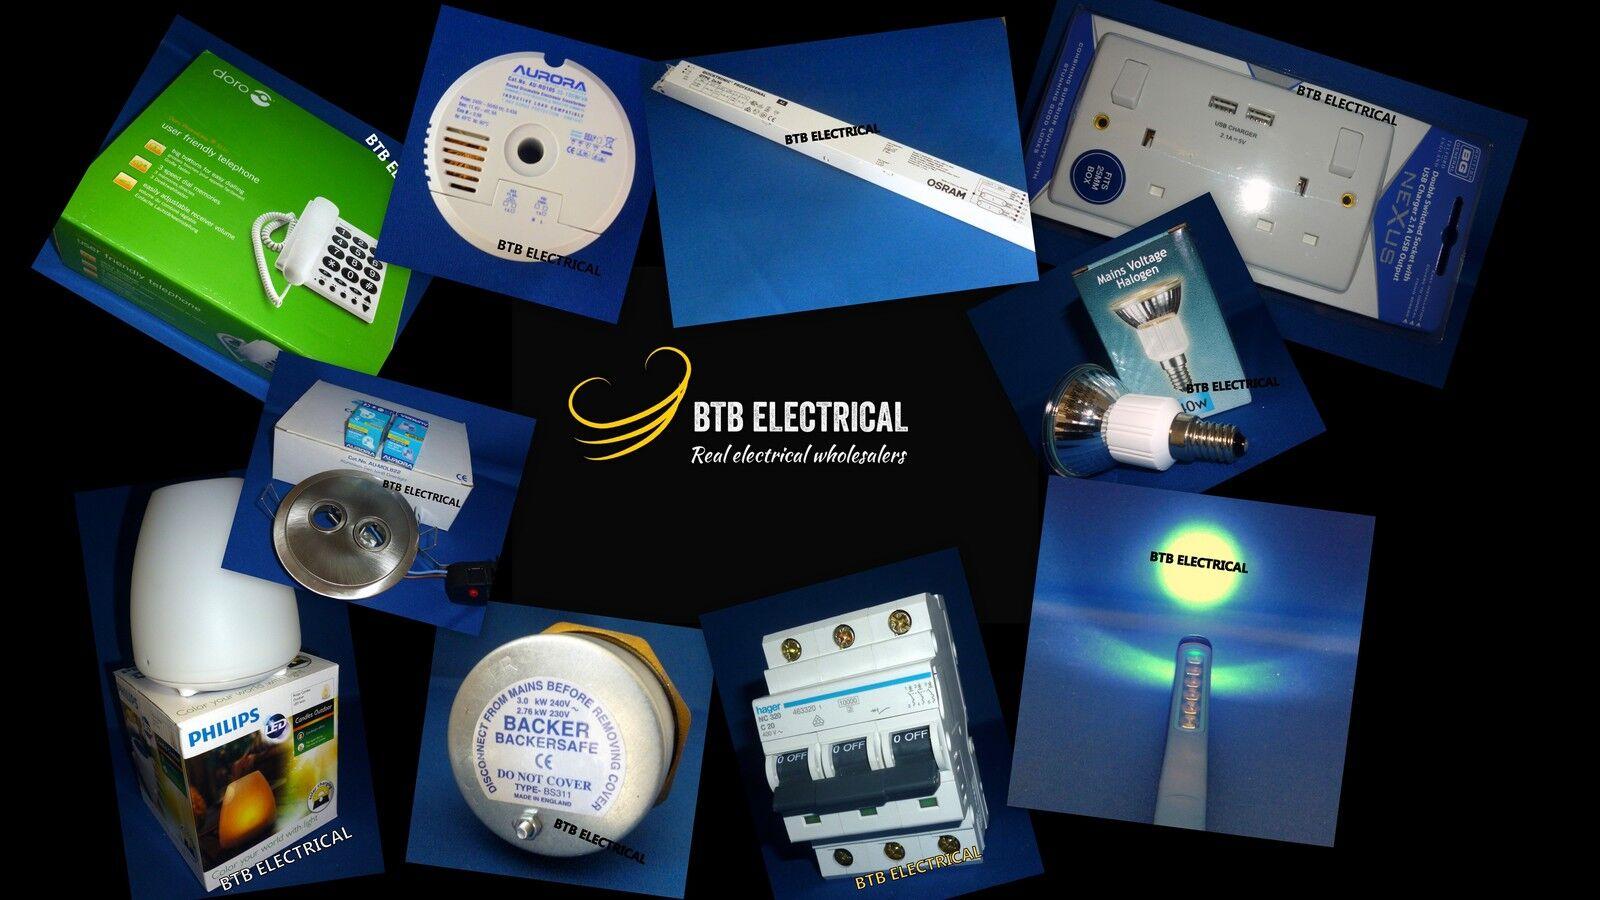 Btb Electrical